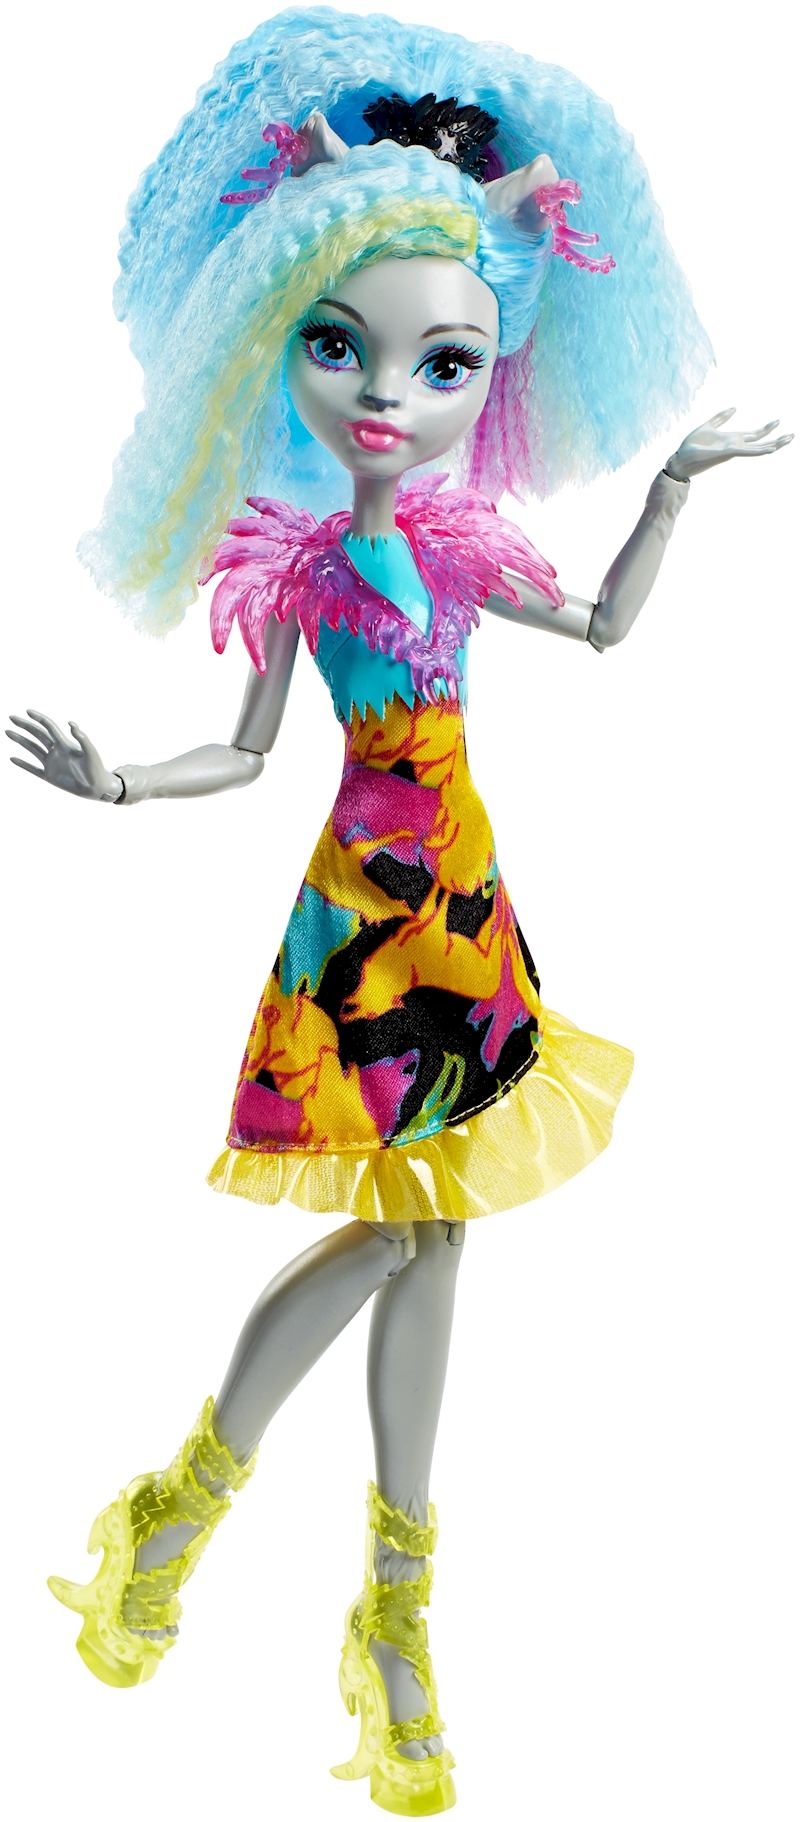 Barbie Fashion Dress Games 2017